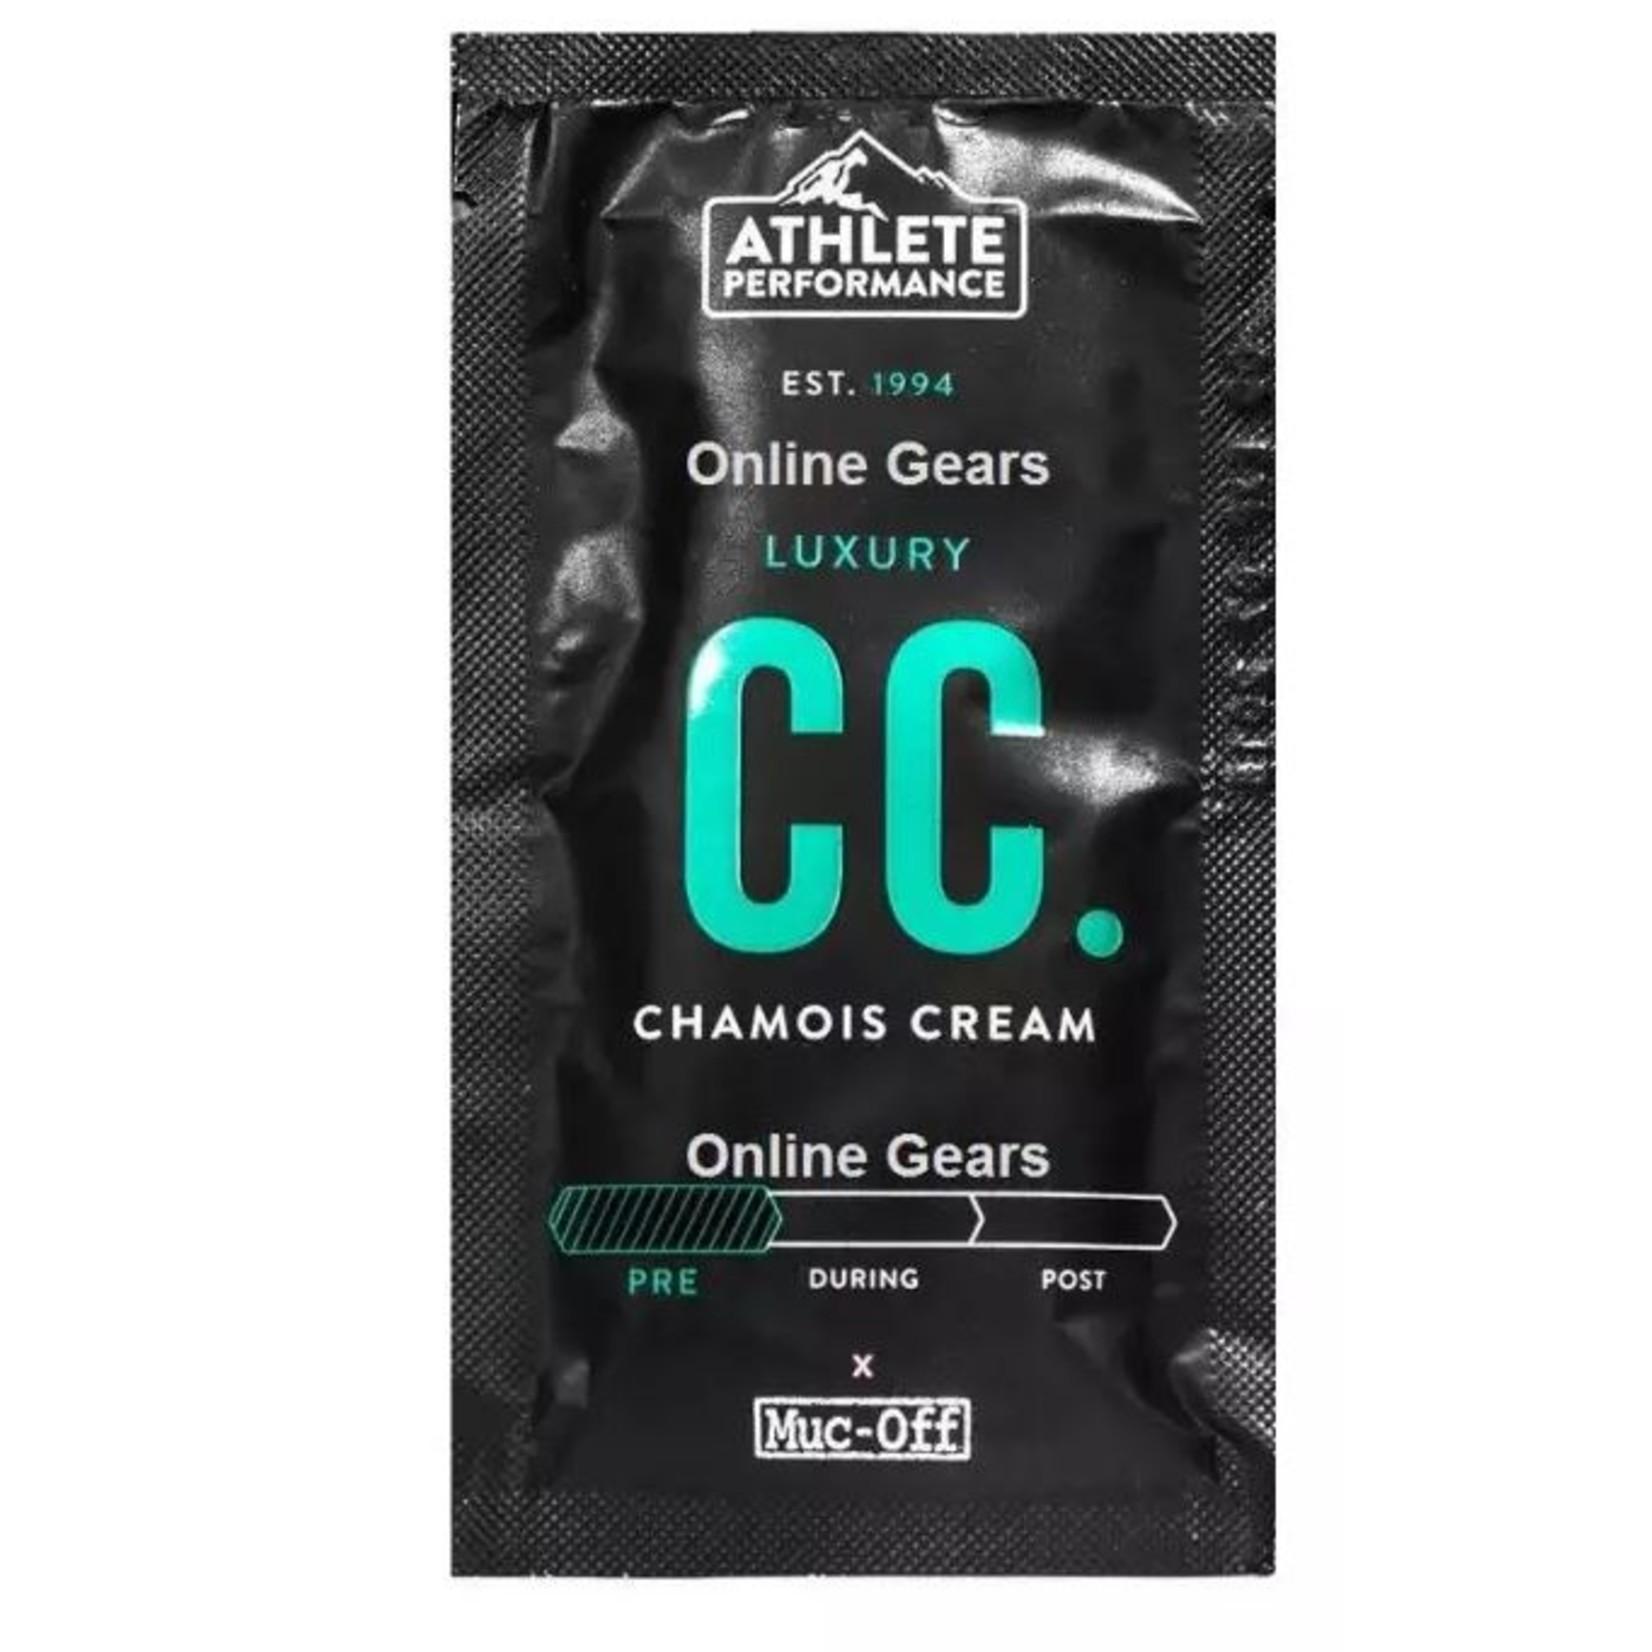 Muc-Off Luxury Chamois Cream Satchet 10ml